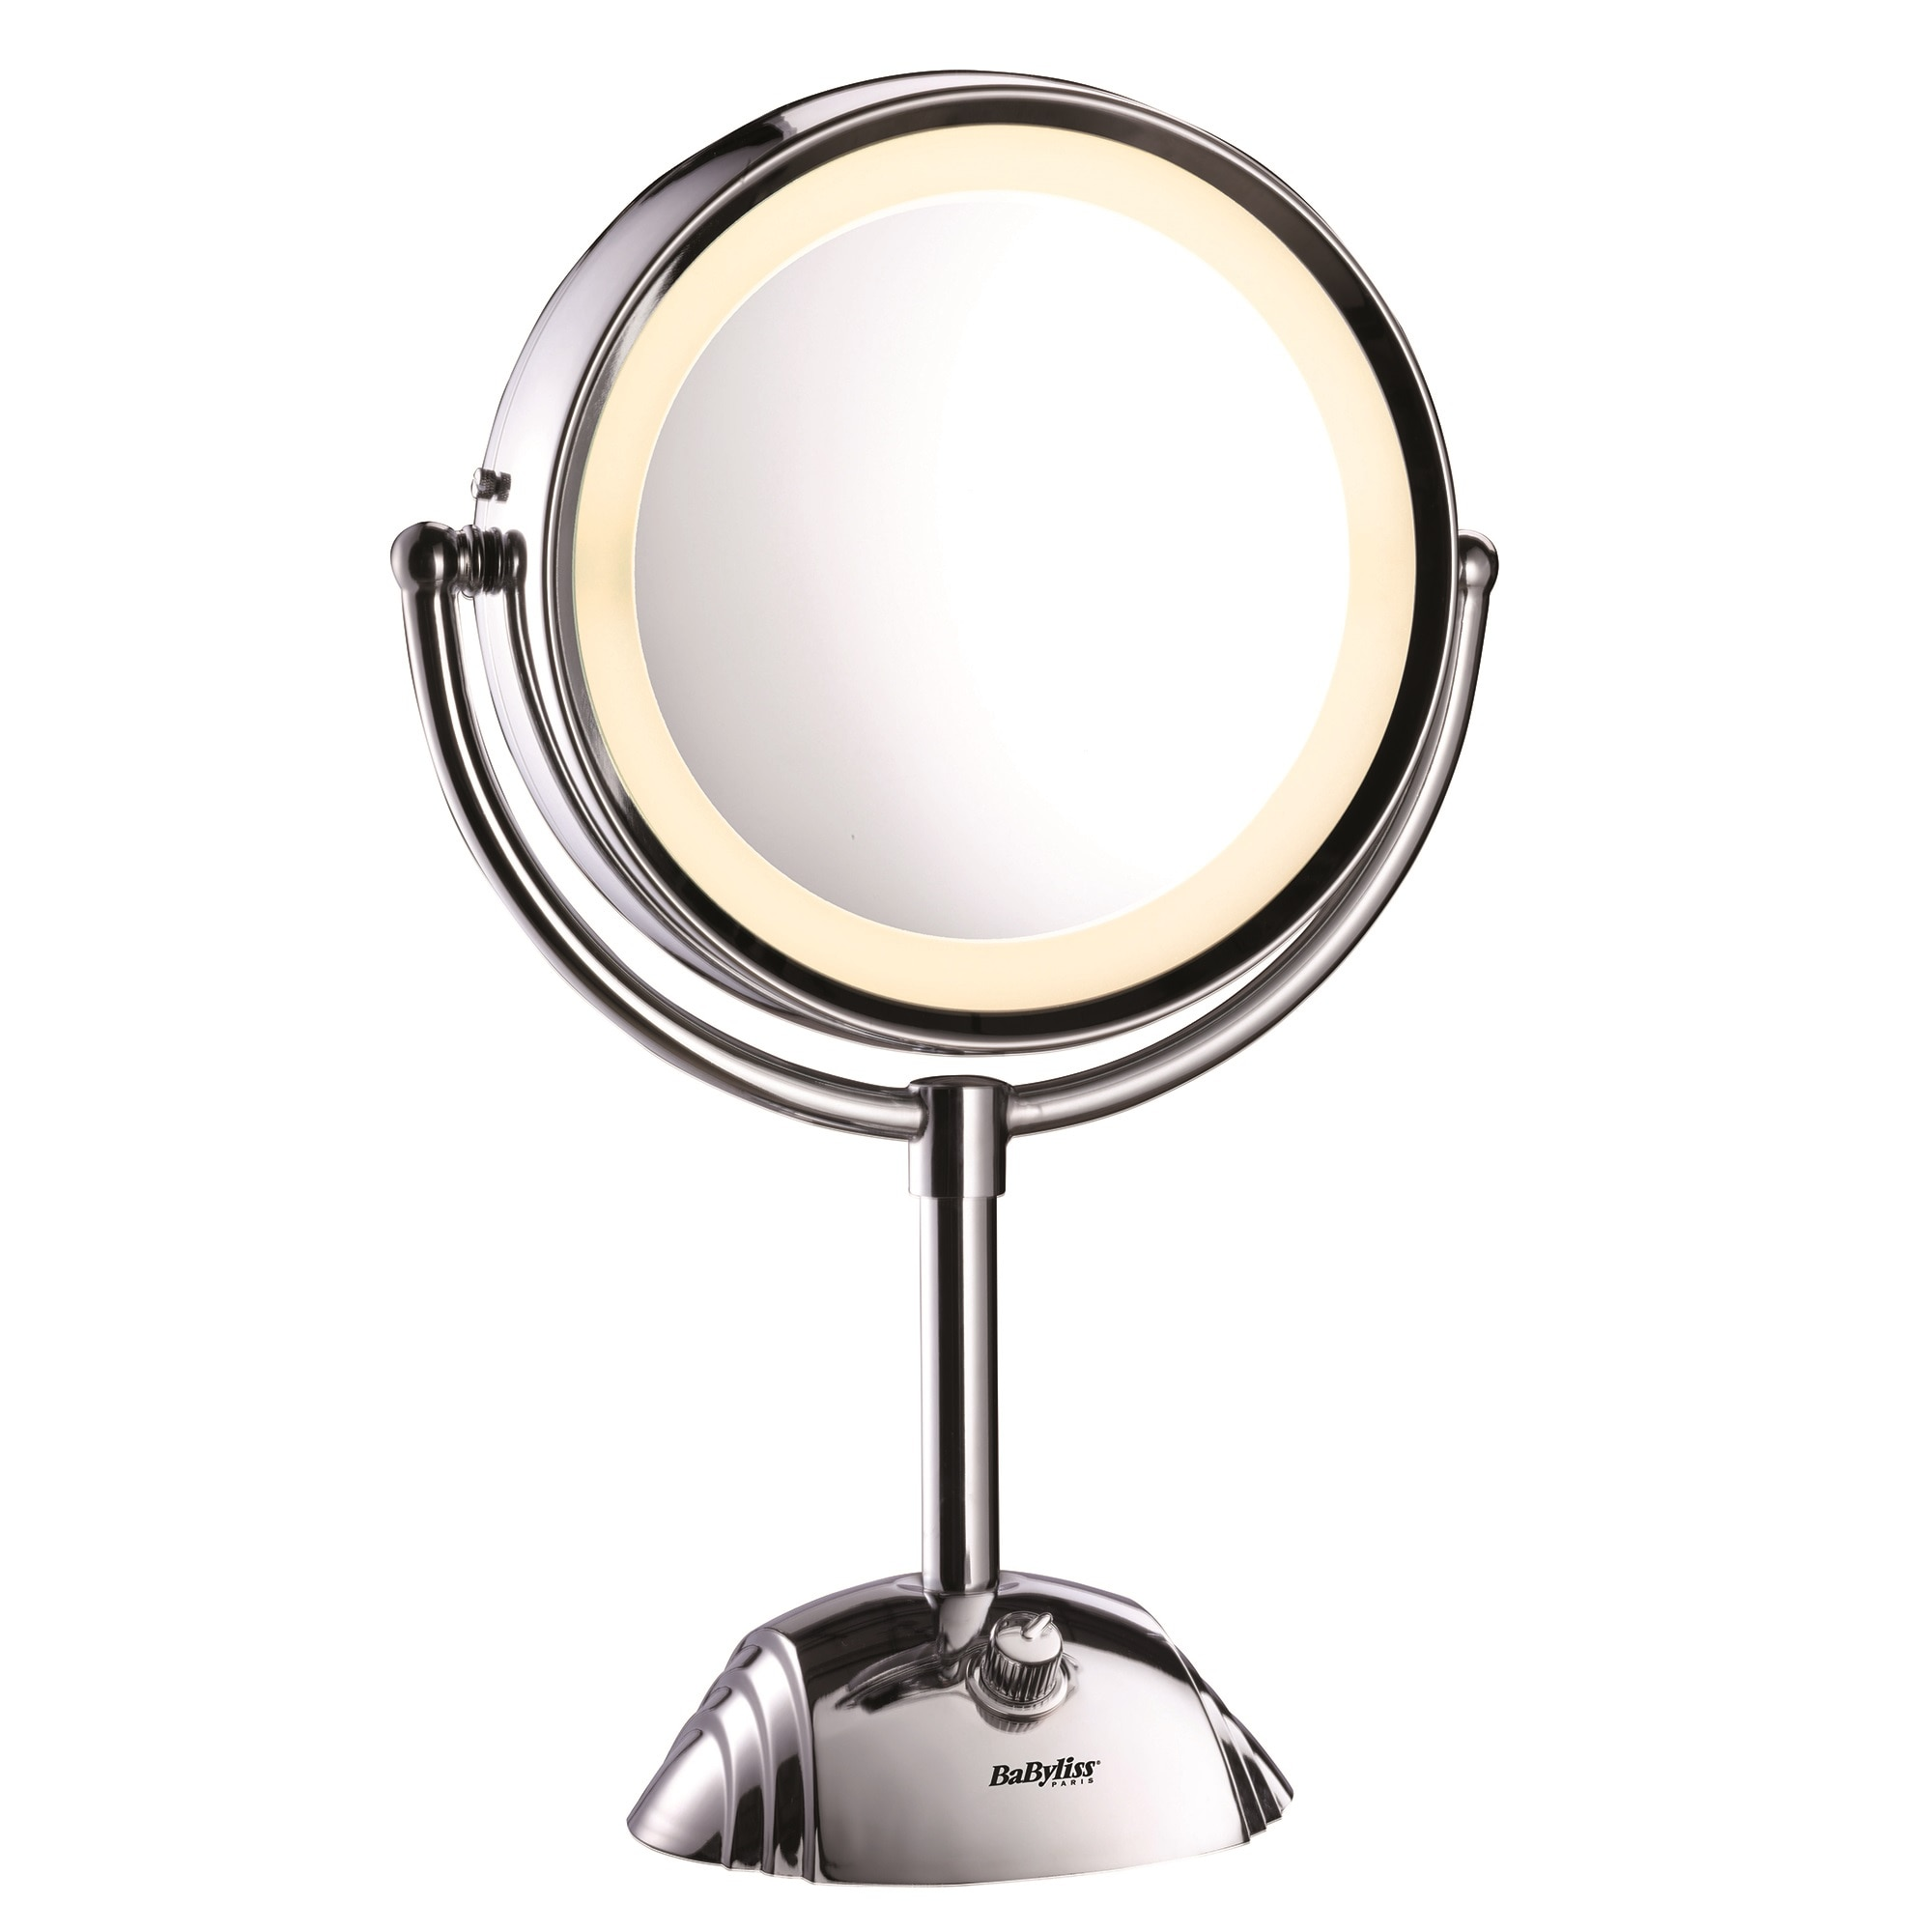 Fotografie Oglinda cosmetica iluminata BaByliss 8438E, Led, 20.5 cm, 2 suprafete de oglinda, Baterii, Alb